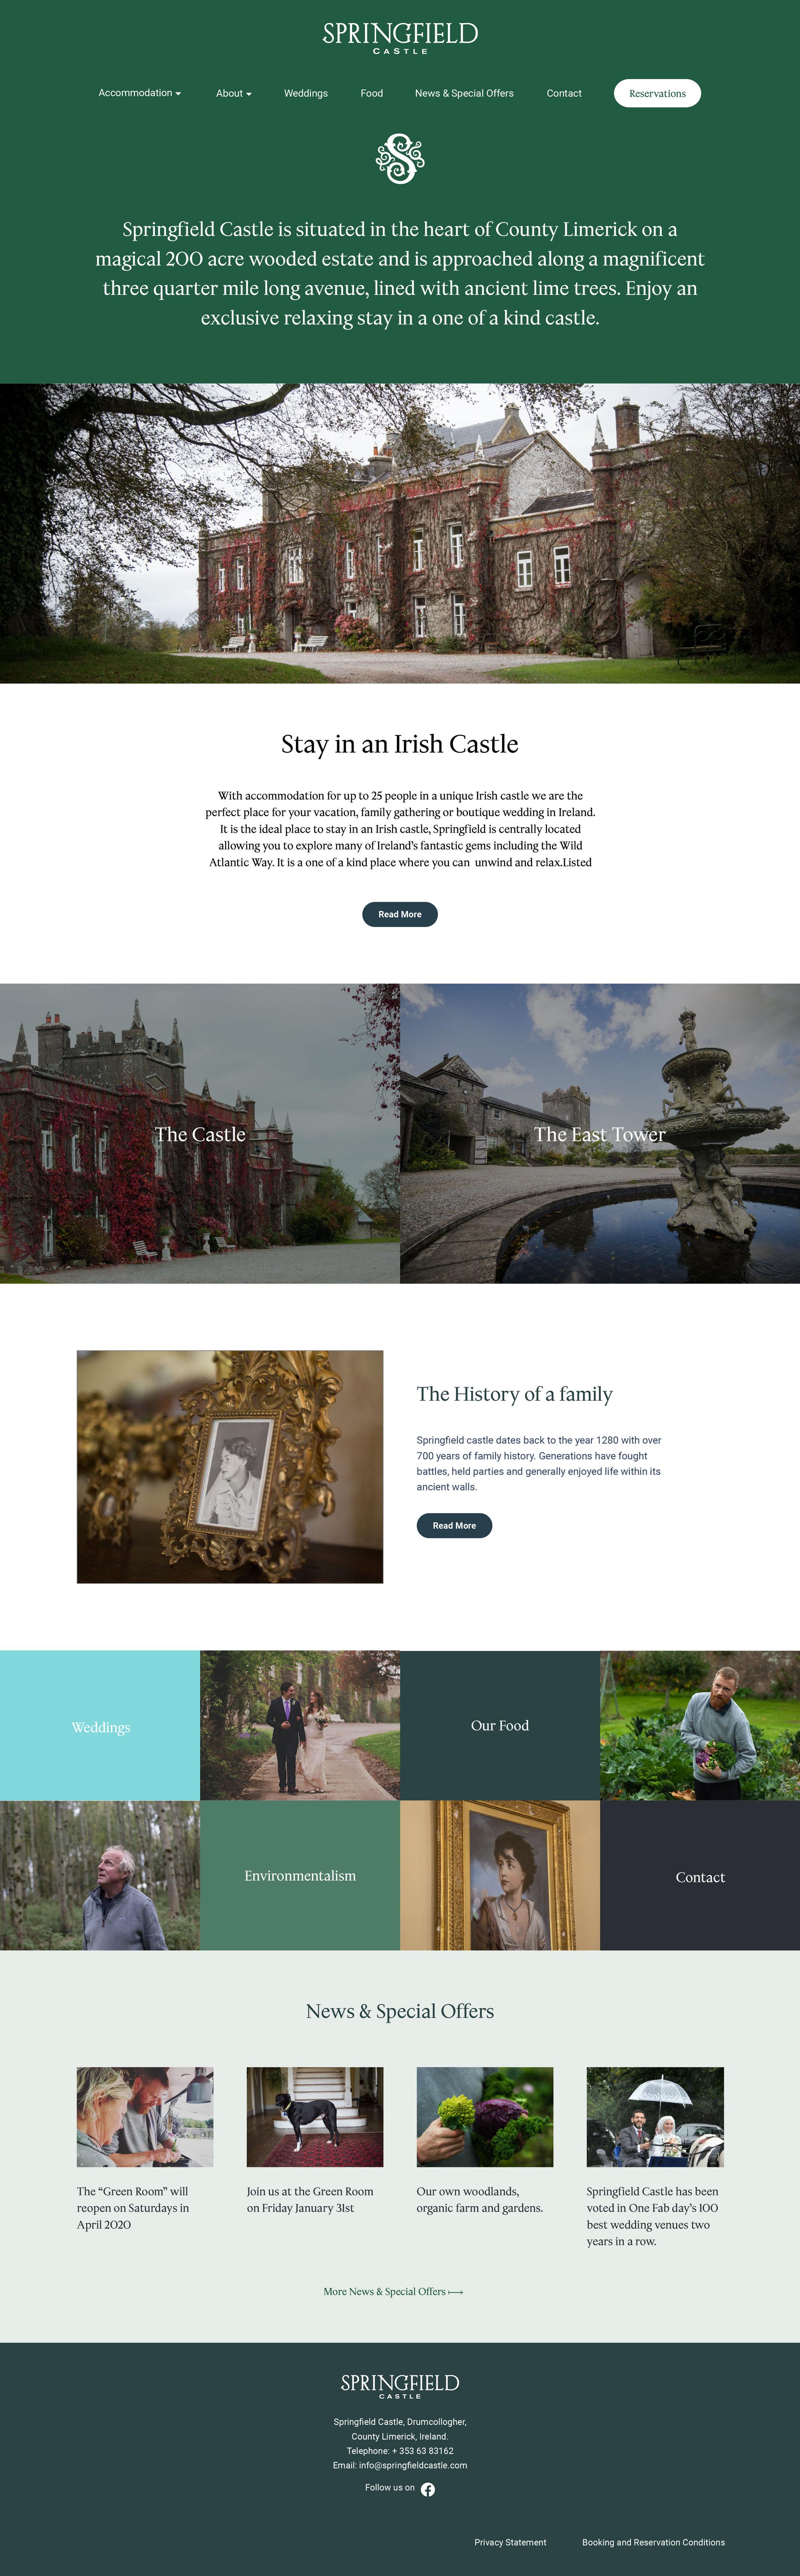 Springfield-Castle-Website-Design-and-Development-Home-final